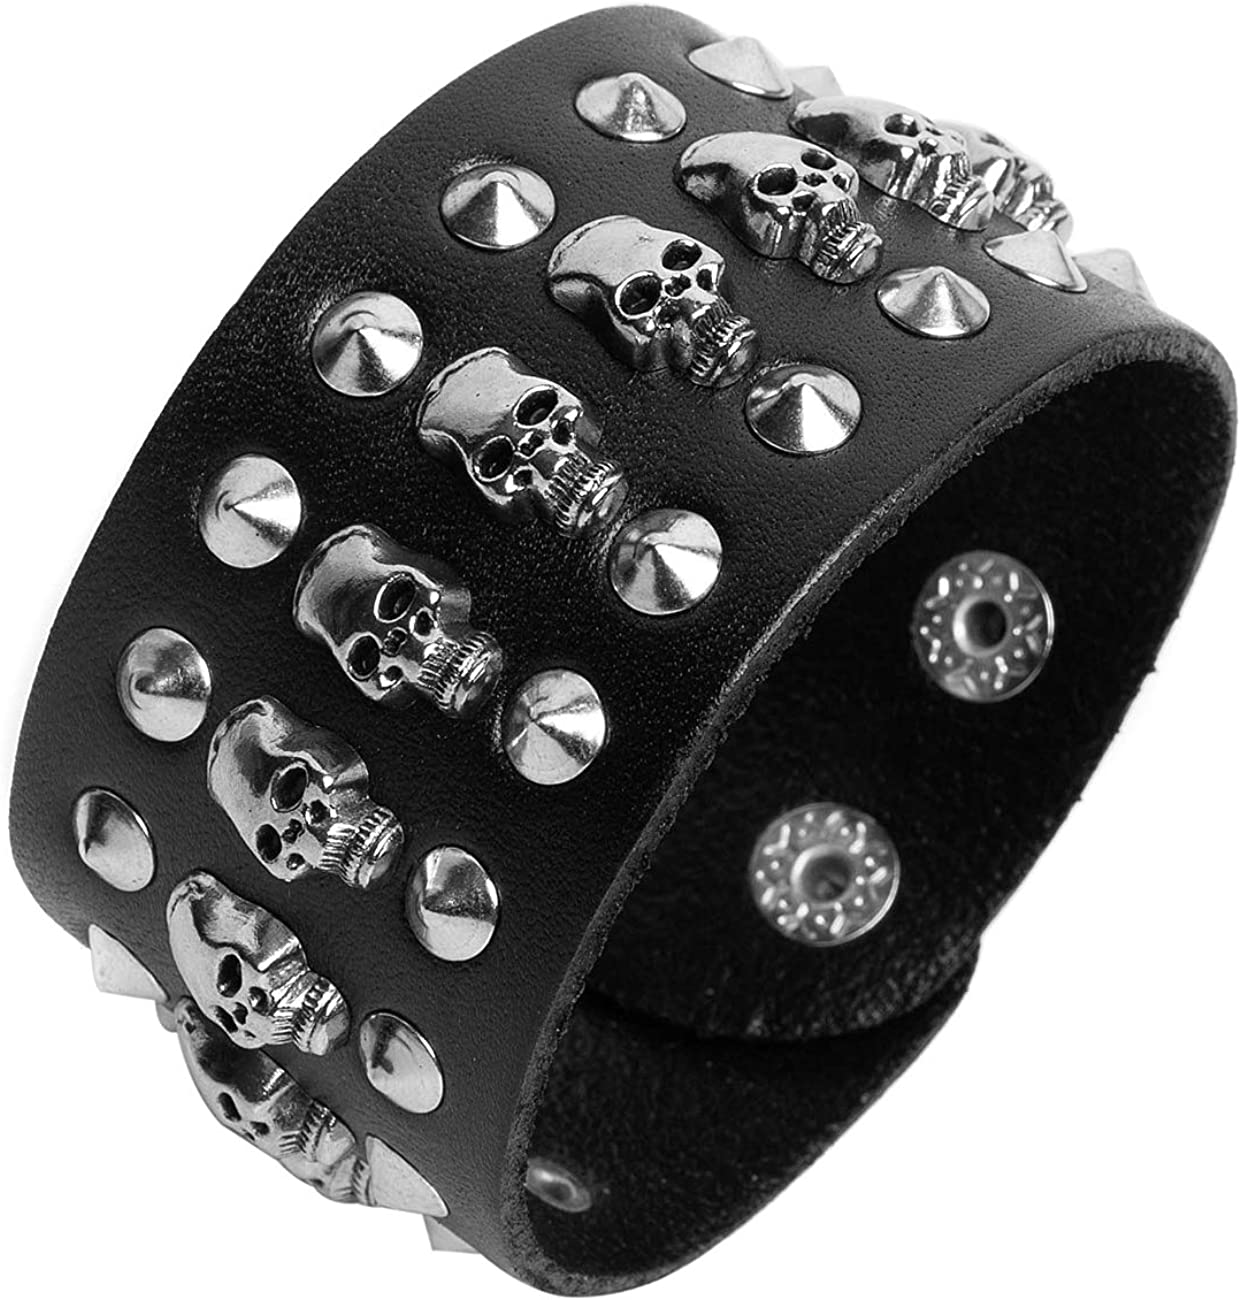 Black metal rivets studs punk rock biker wide belt leather bracelet guard wrist strap skull